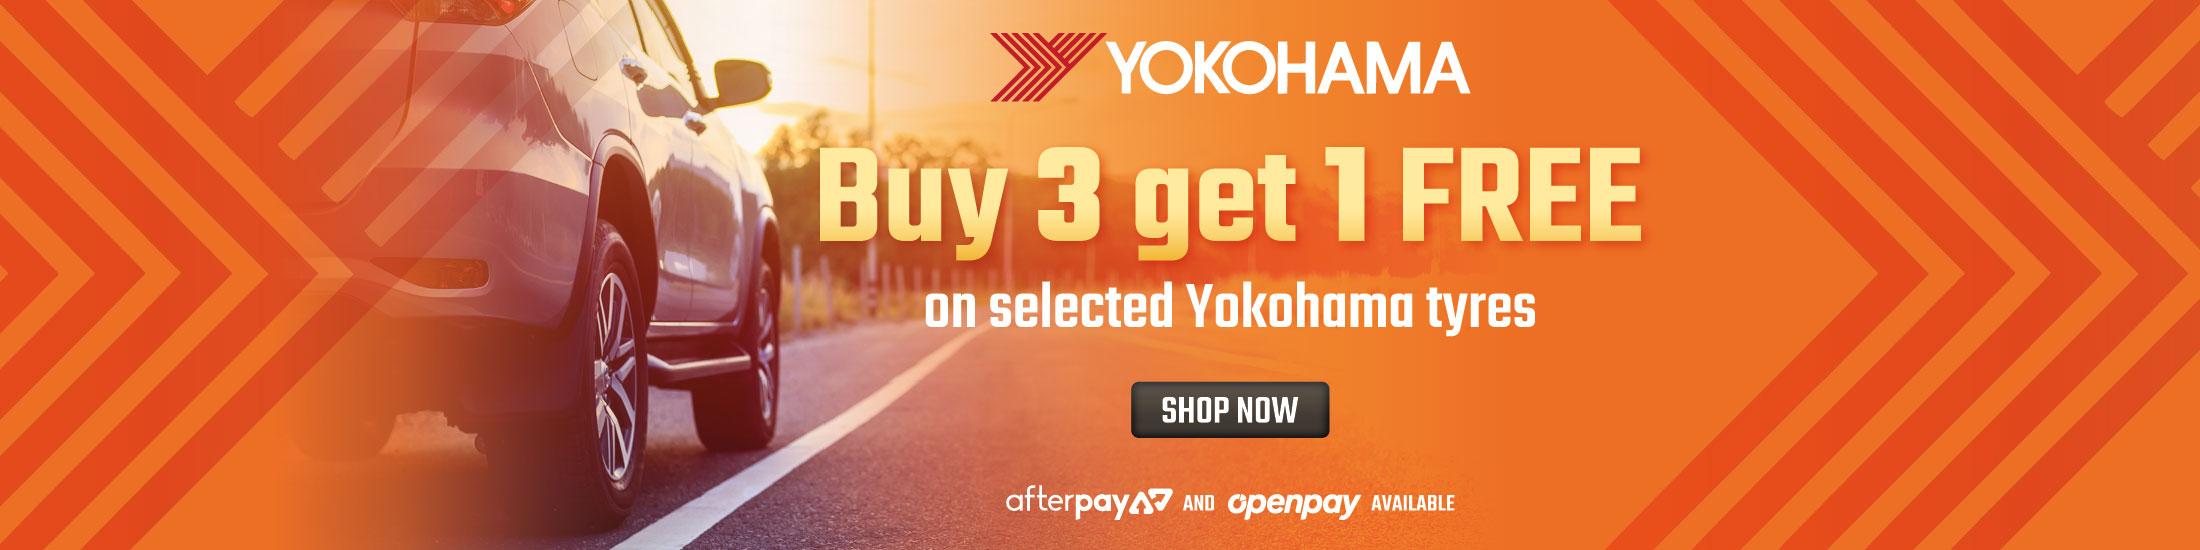 Yokohama Buy 3 Get 1 Free Promo